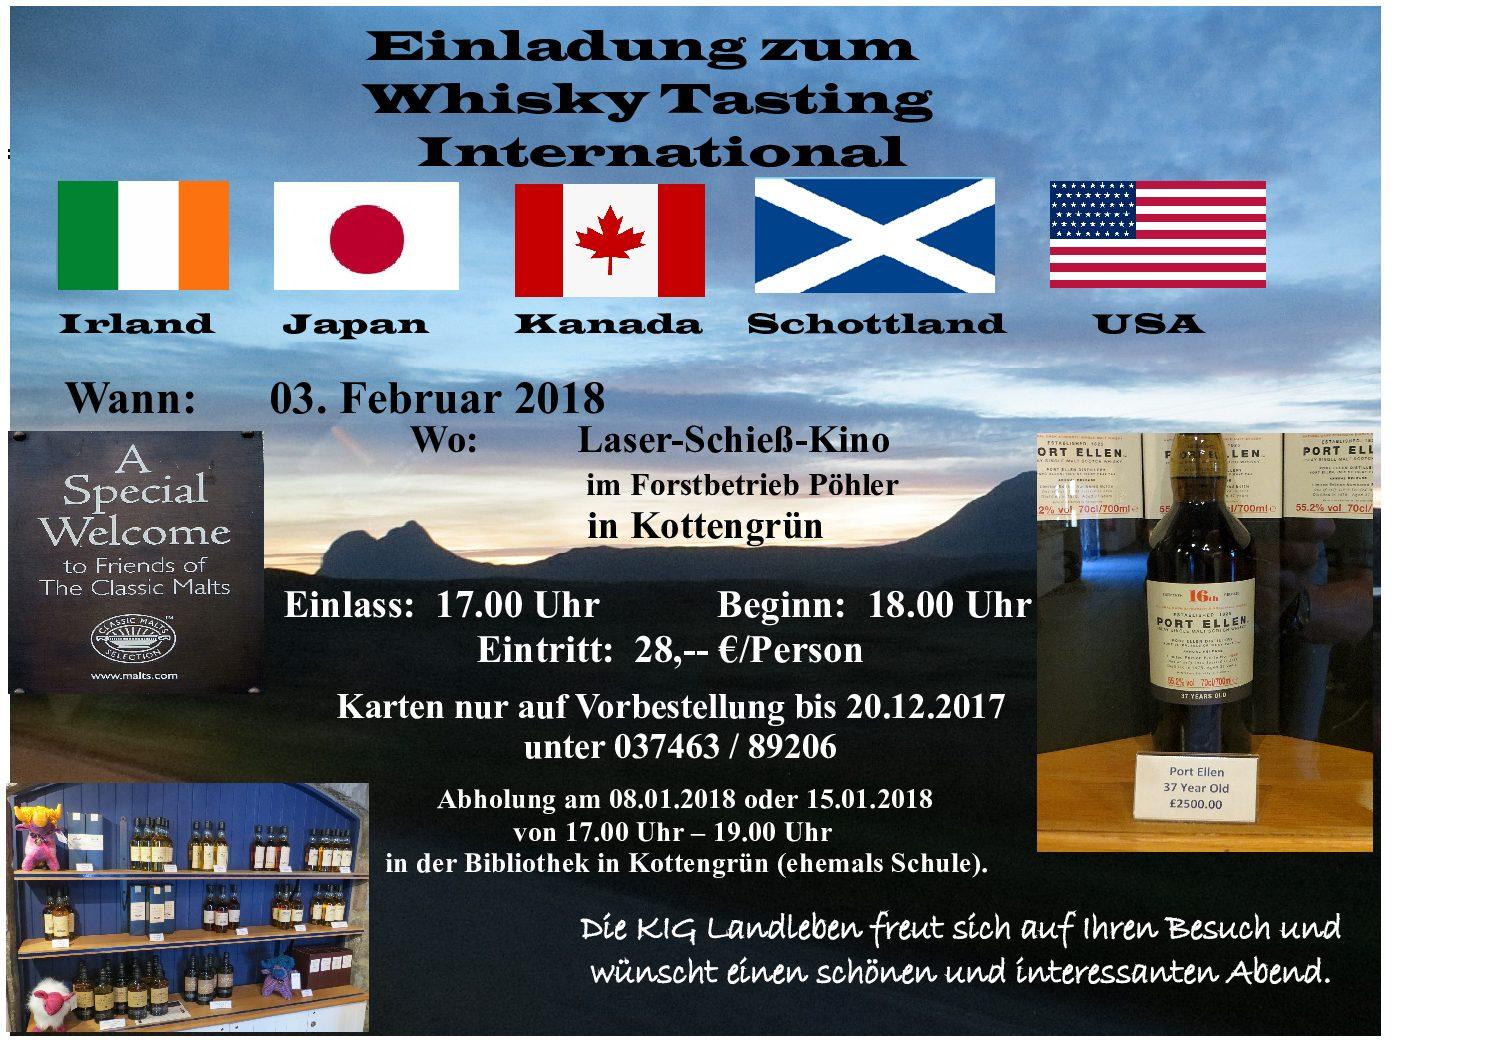 Whisky Tasting International